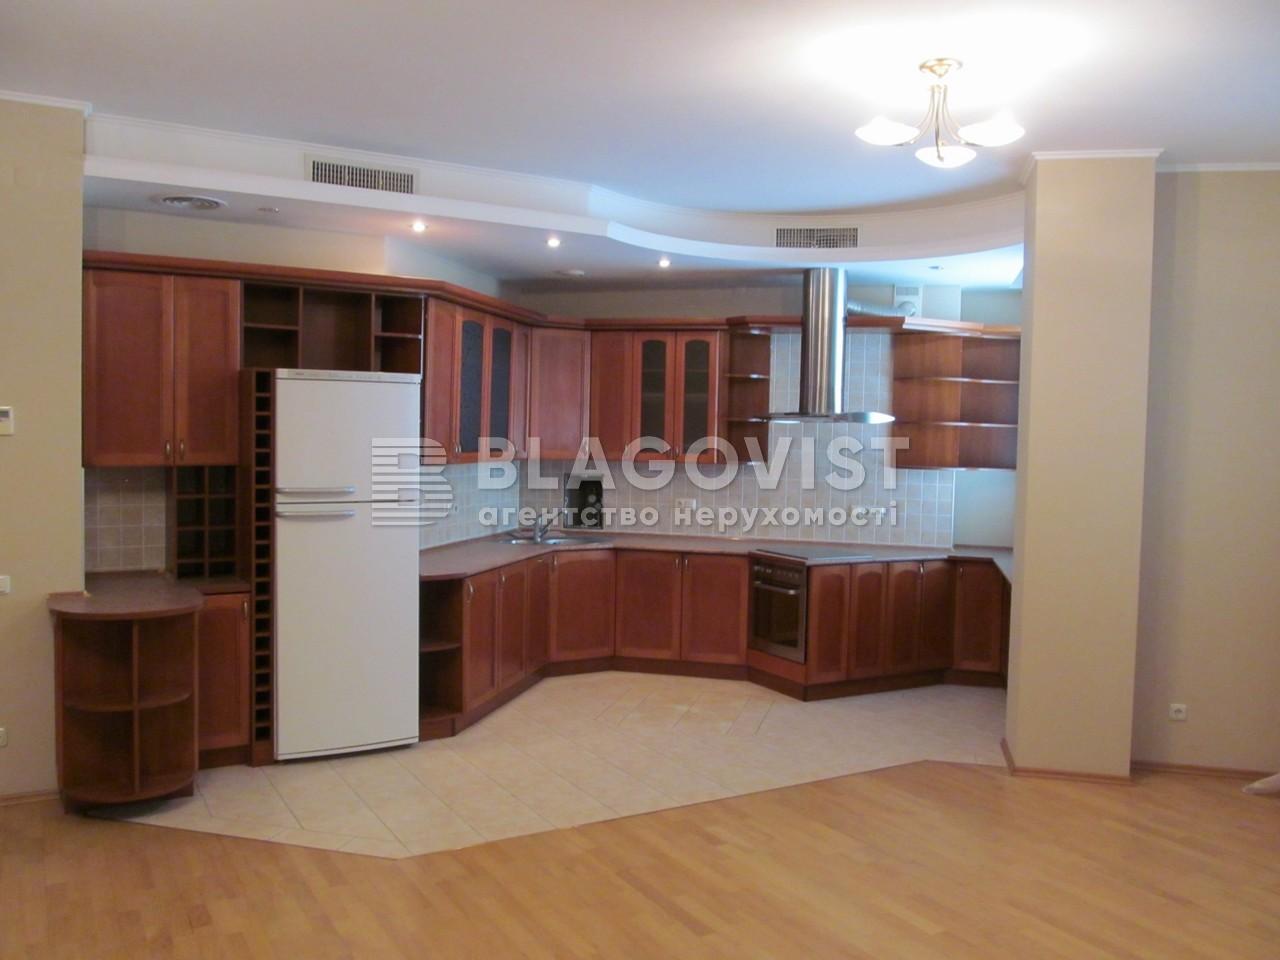 Квартира Z-1439953, Деревлянская (Якира), 10а, Киев - Фото 6